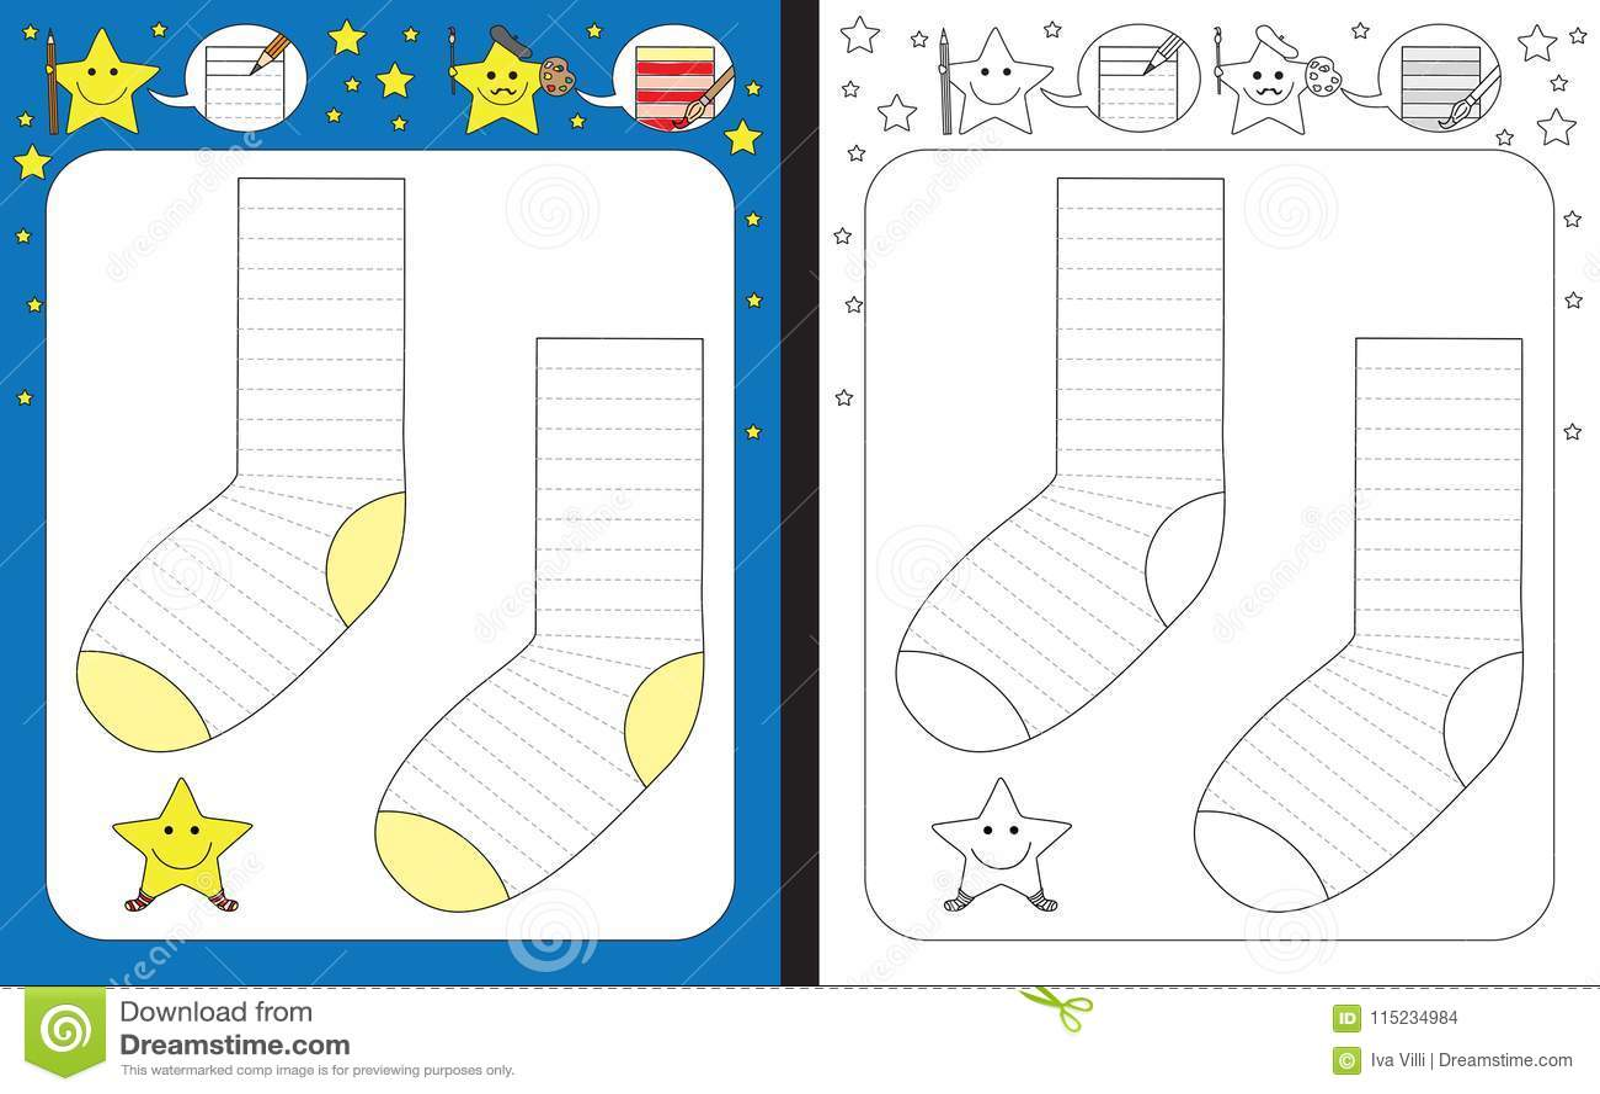 Preschool Worksheet Stock Vector Illustration Of Socks